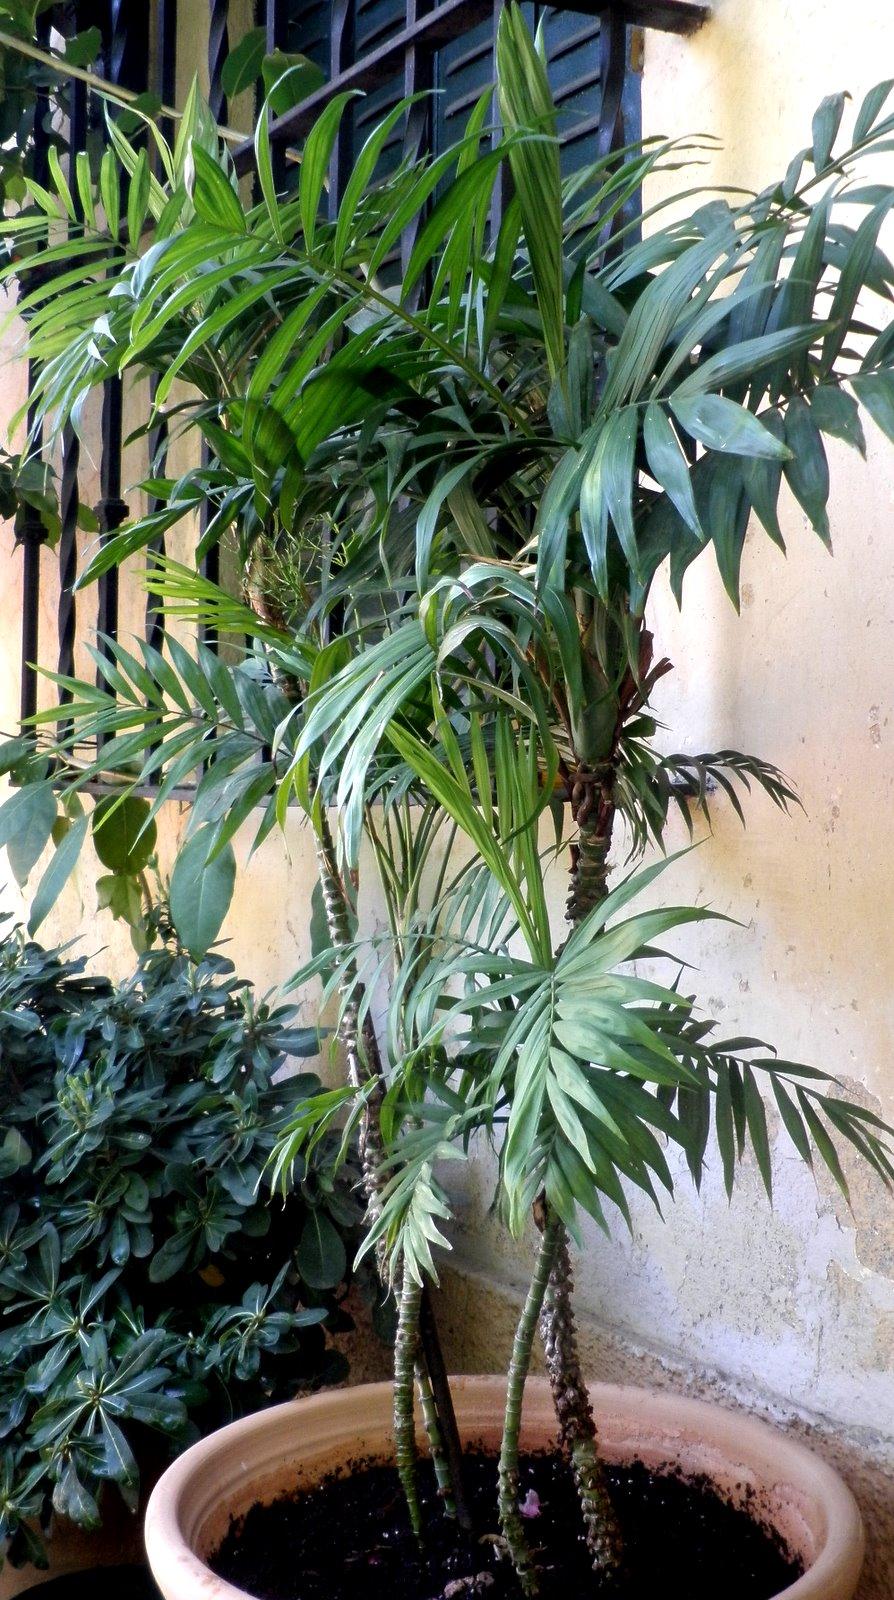 Jardinbio ficus benjamina y chamaedorea seifrizii palmera bambu - Bambu planta exterior ...